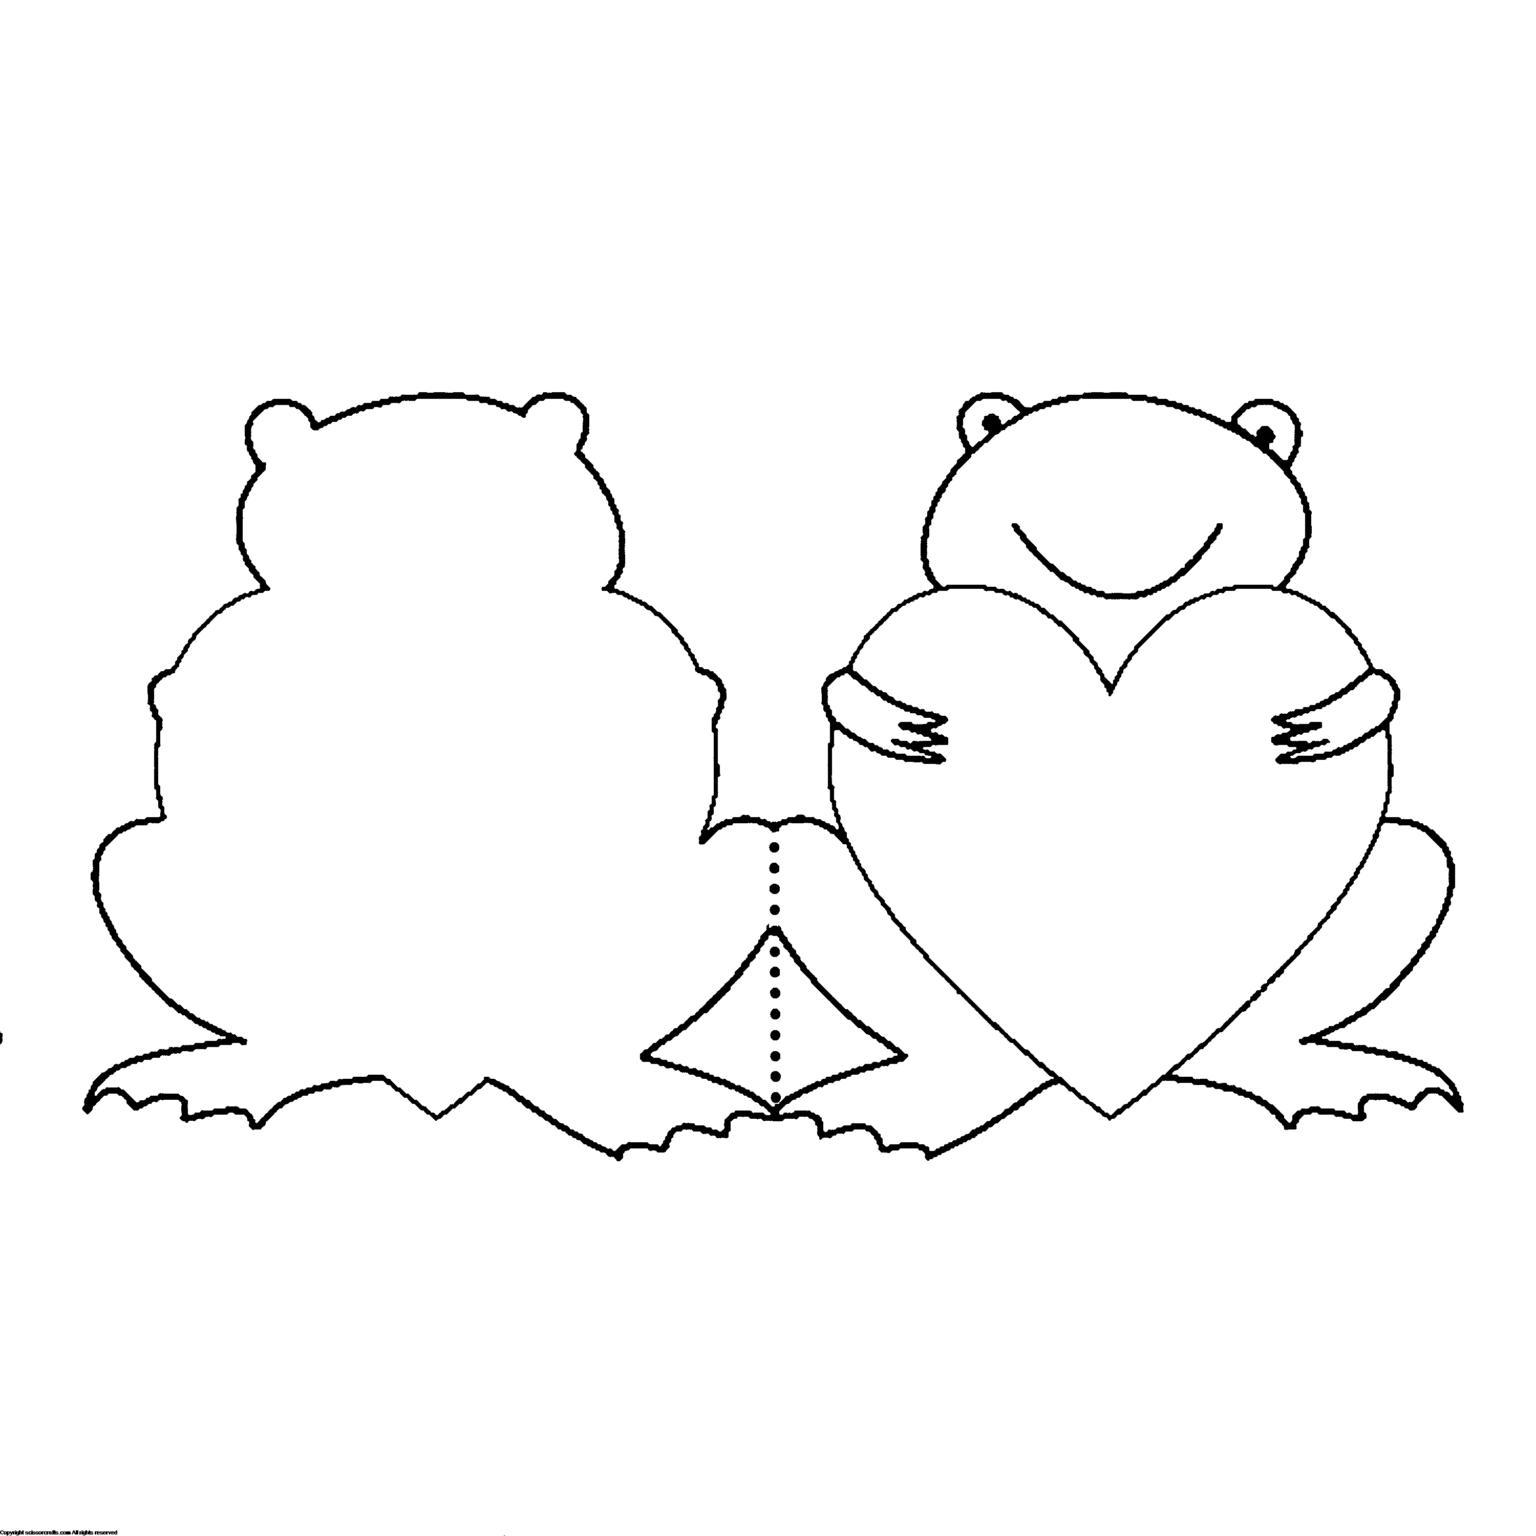 tangram frog tangram arrow shape and solution free printable puzzle games frog tangram